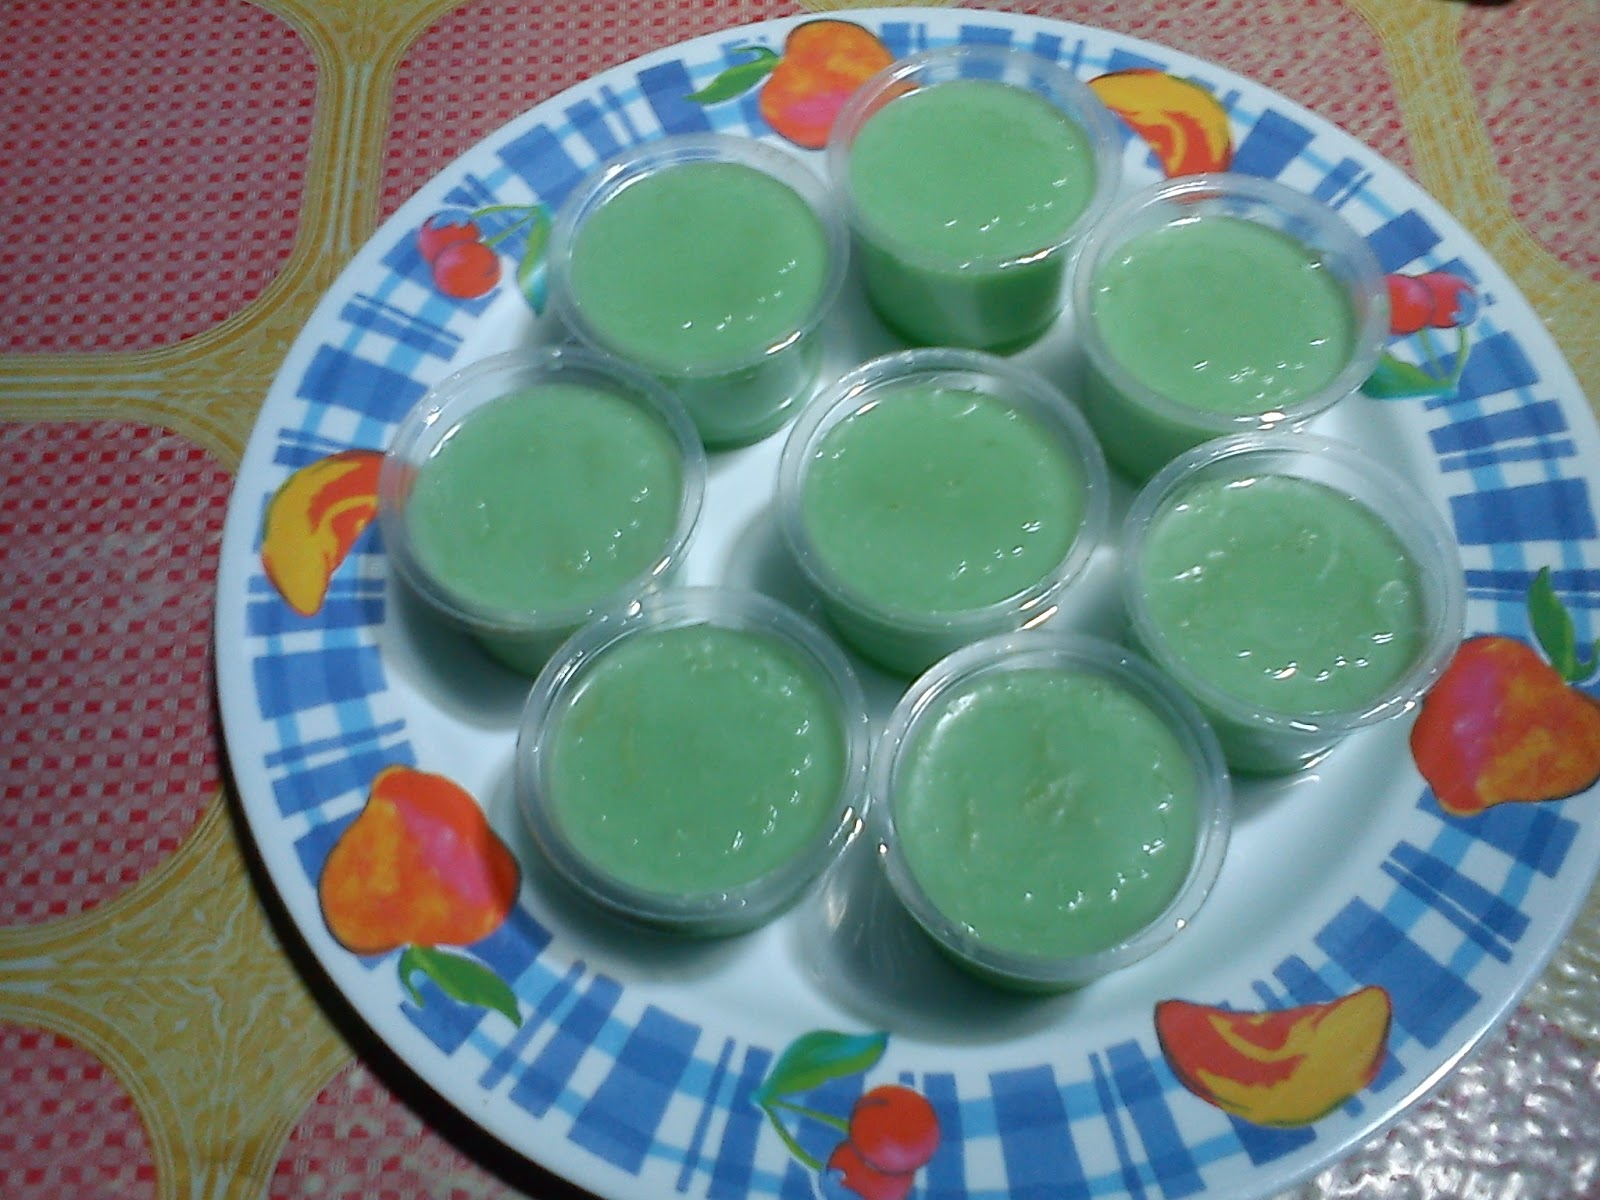 puding hijau lumut sama puding karang alias gula merah biar keren nama